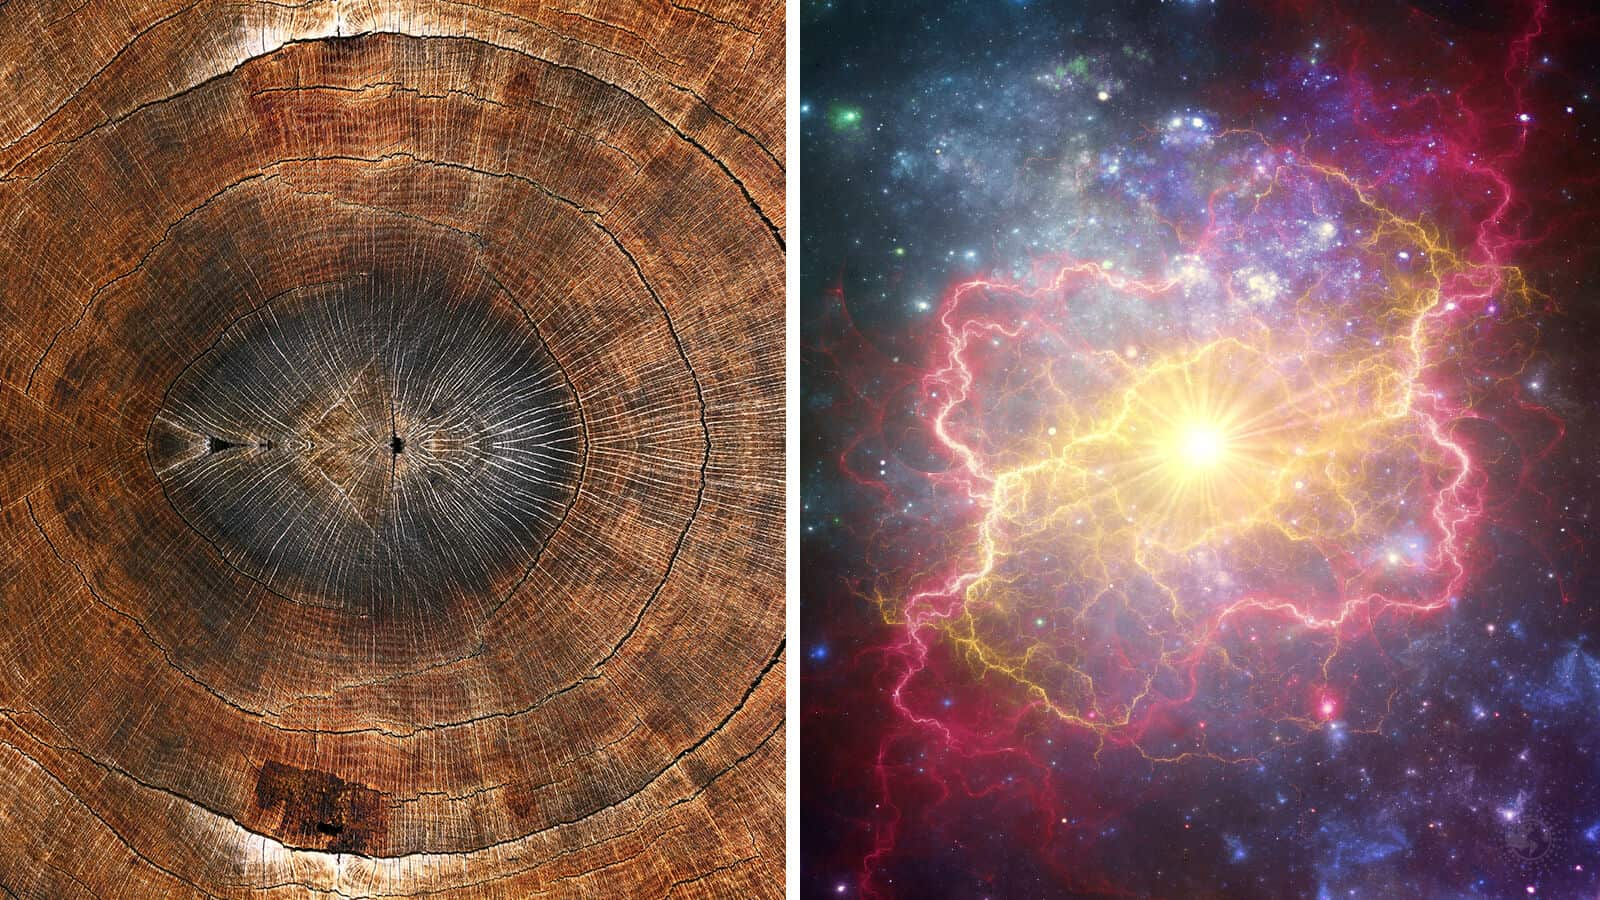 supernova activity